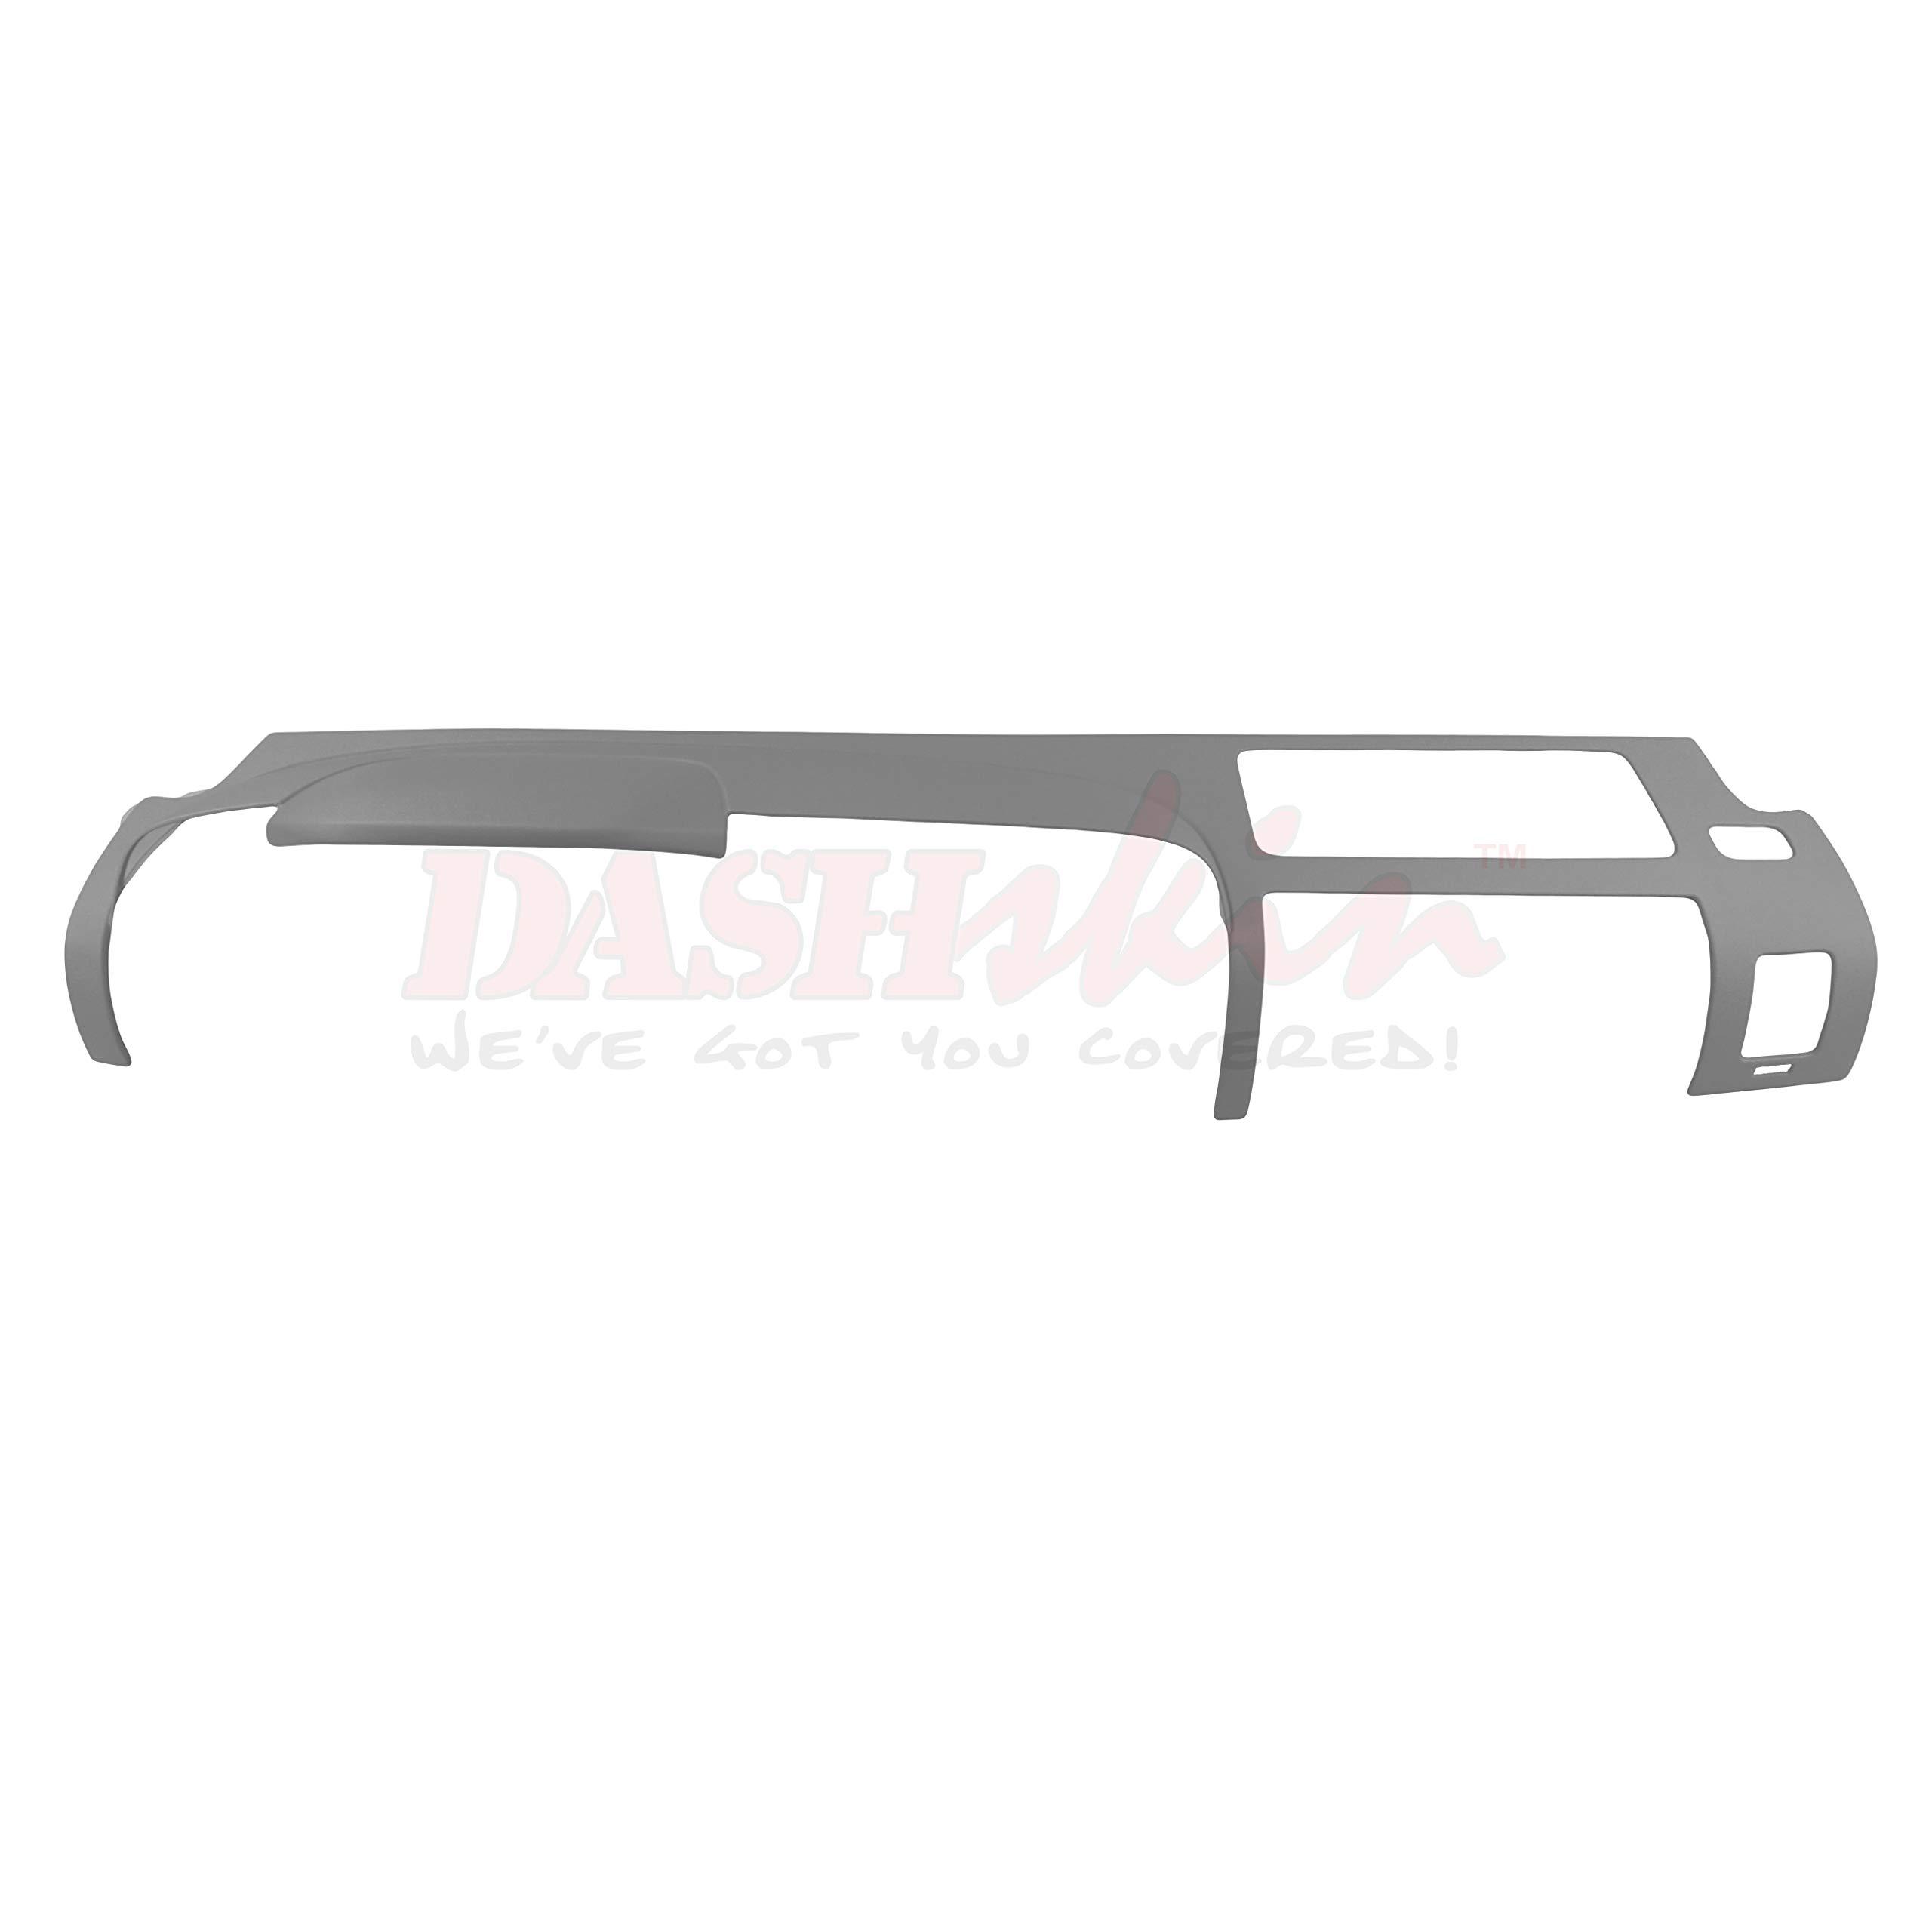 DashSkin Molded Main Dash Cover Compatible with 07-13 Silverado LS/LT & Sierra SL/SLE in Dark Titanium